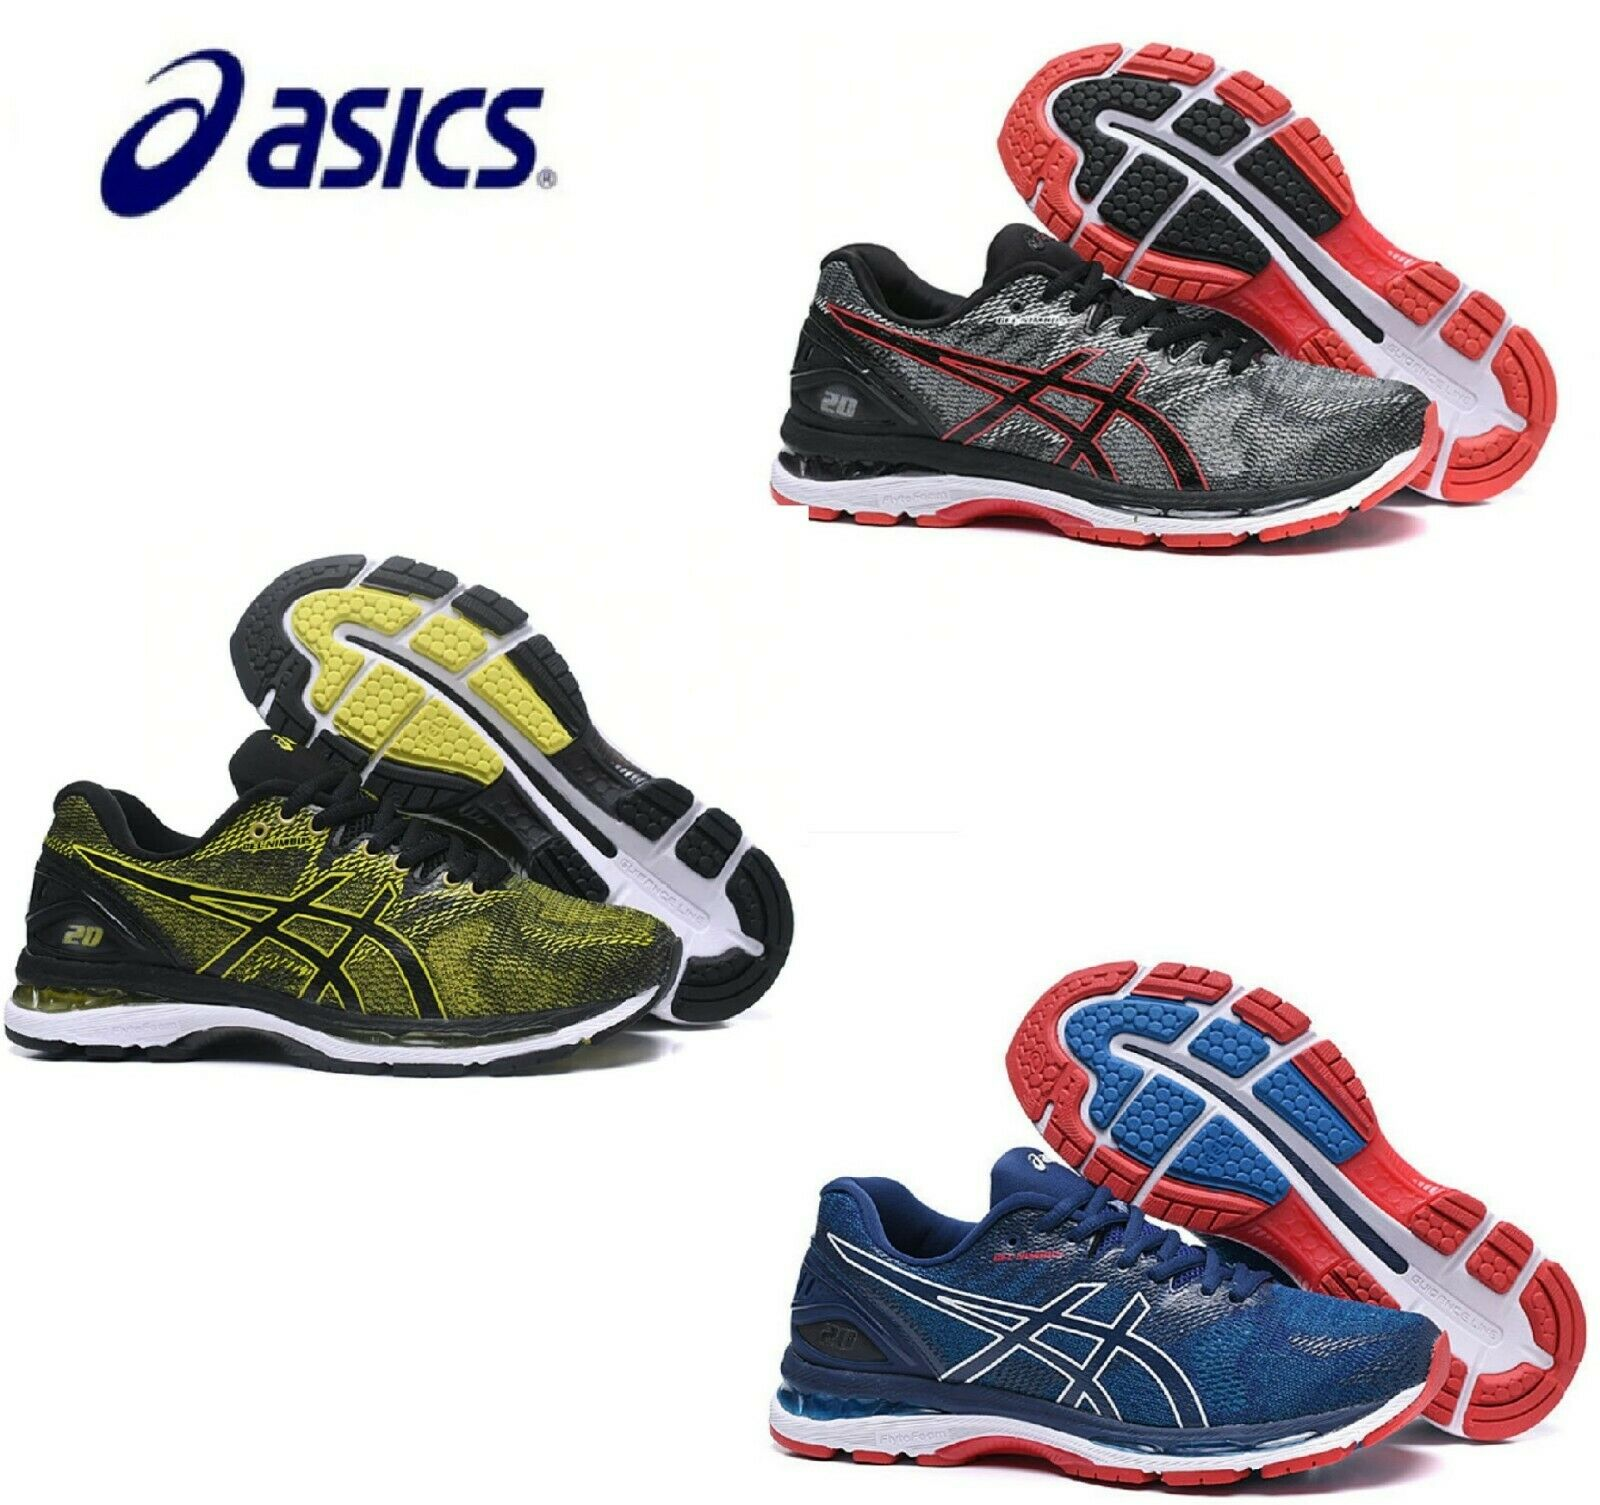 ASICS Gel Nimbus 20 Hombre Para Correr Zapatos Tenis Deportivos Transpirables Deportes Gym